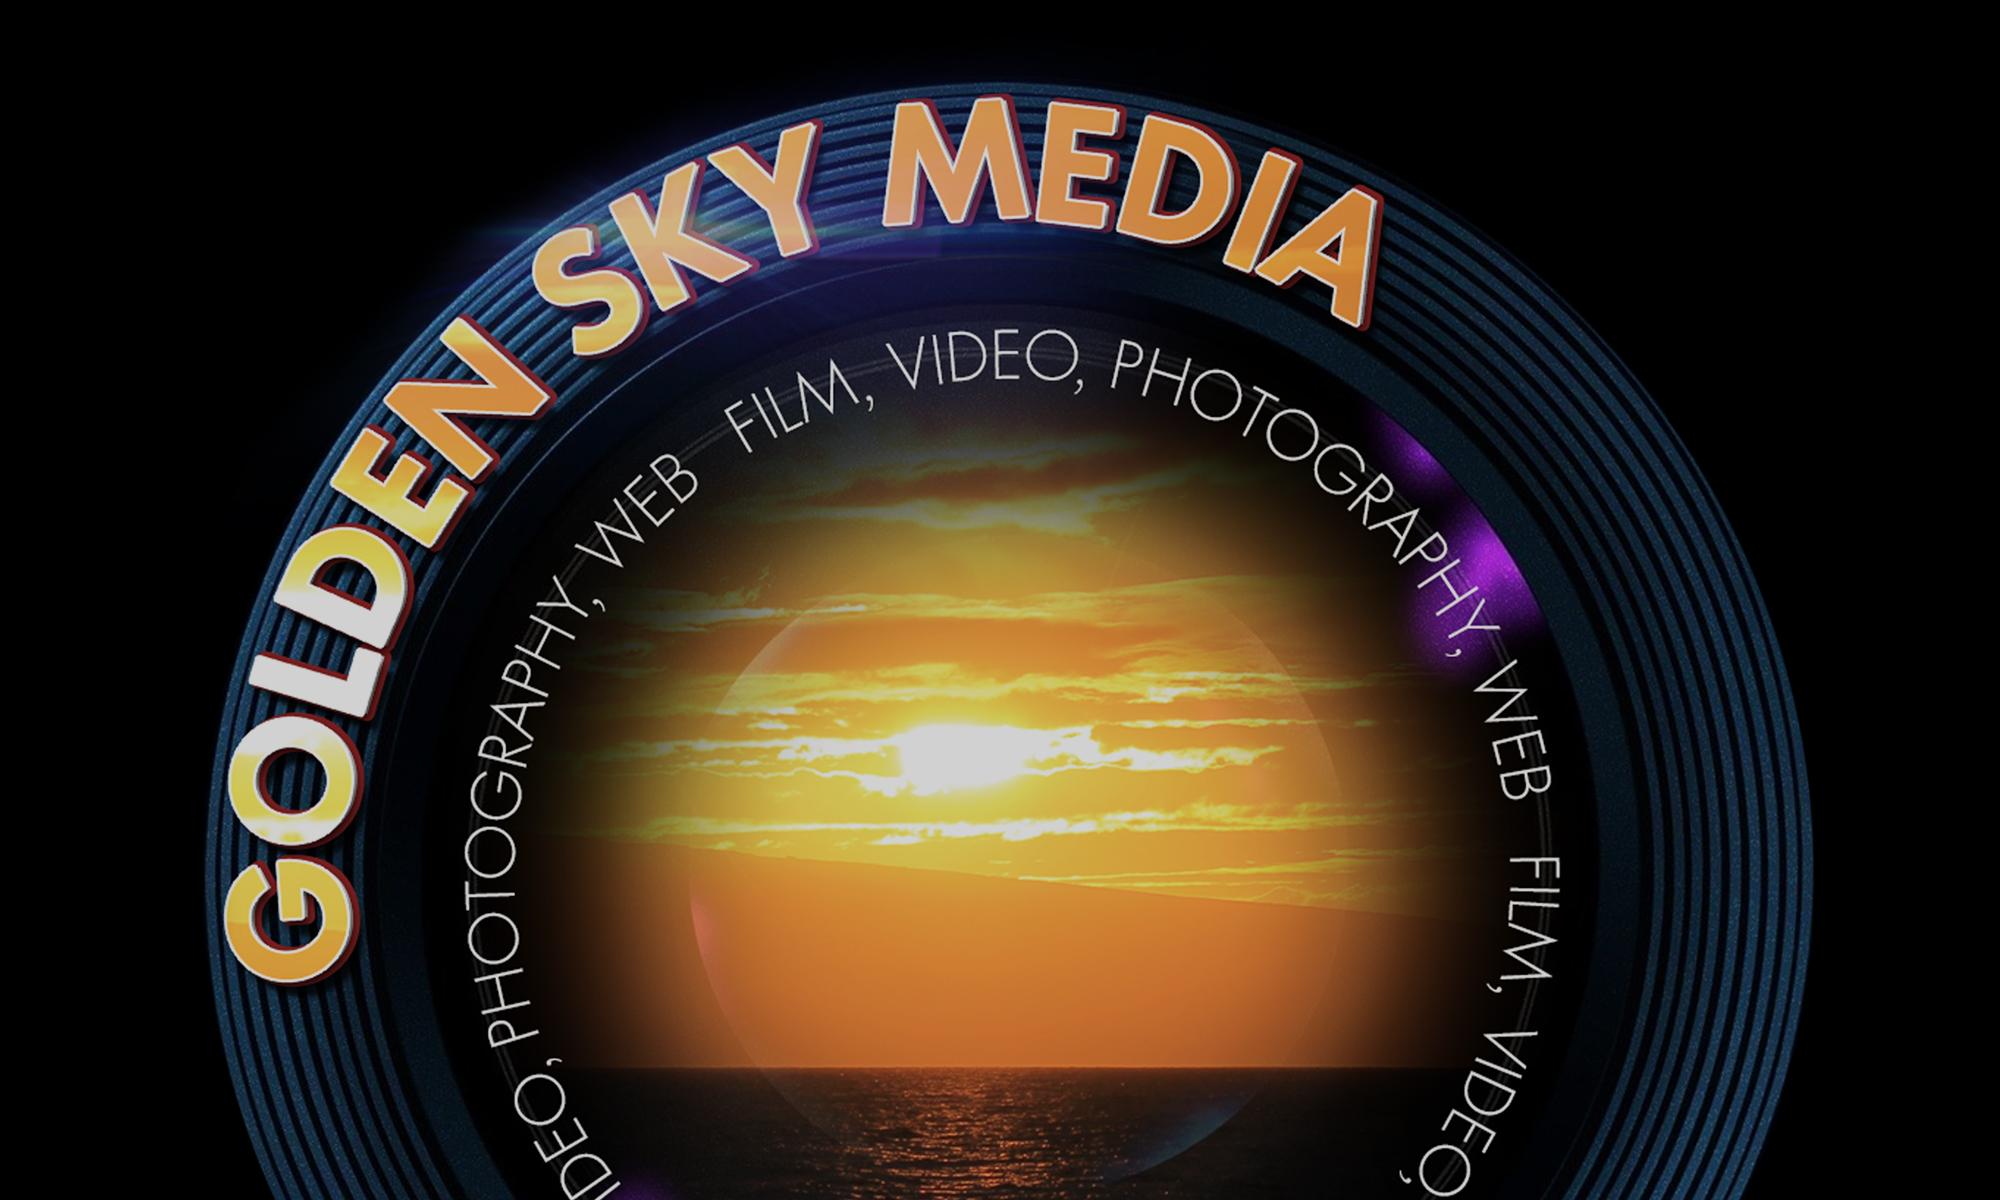 Golden Sky Media